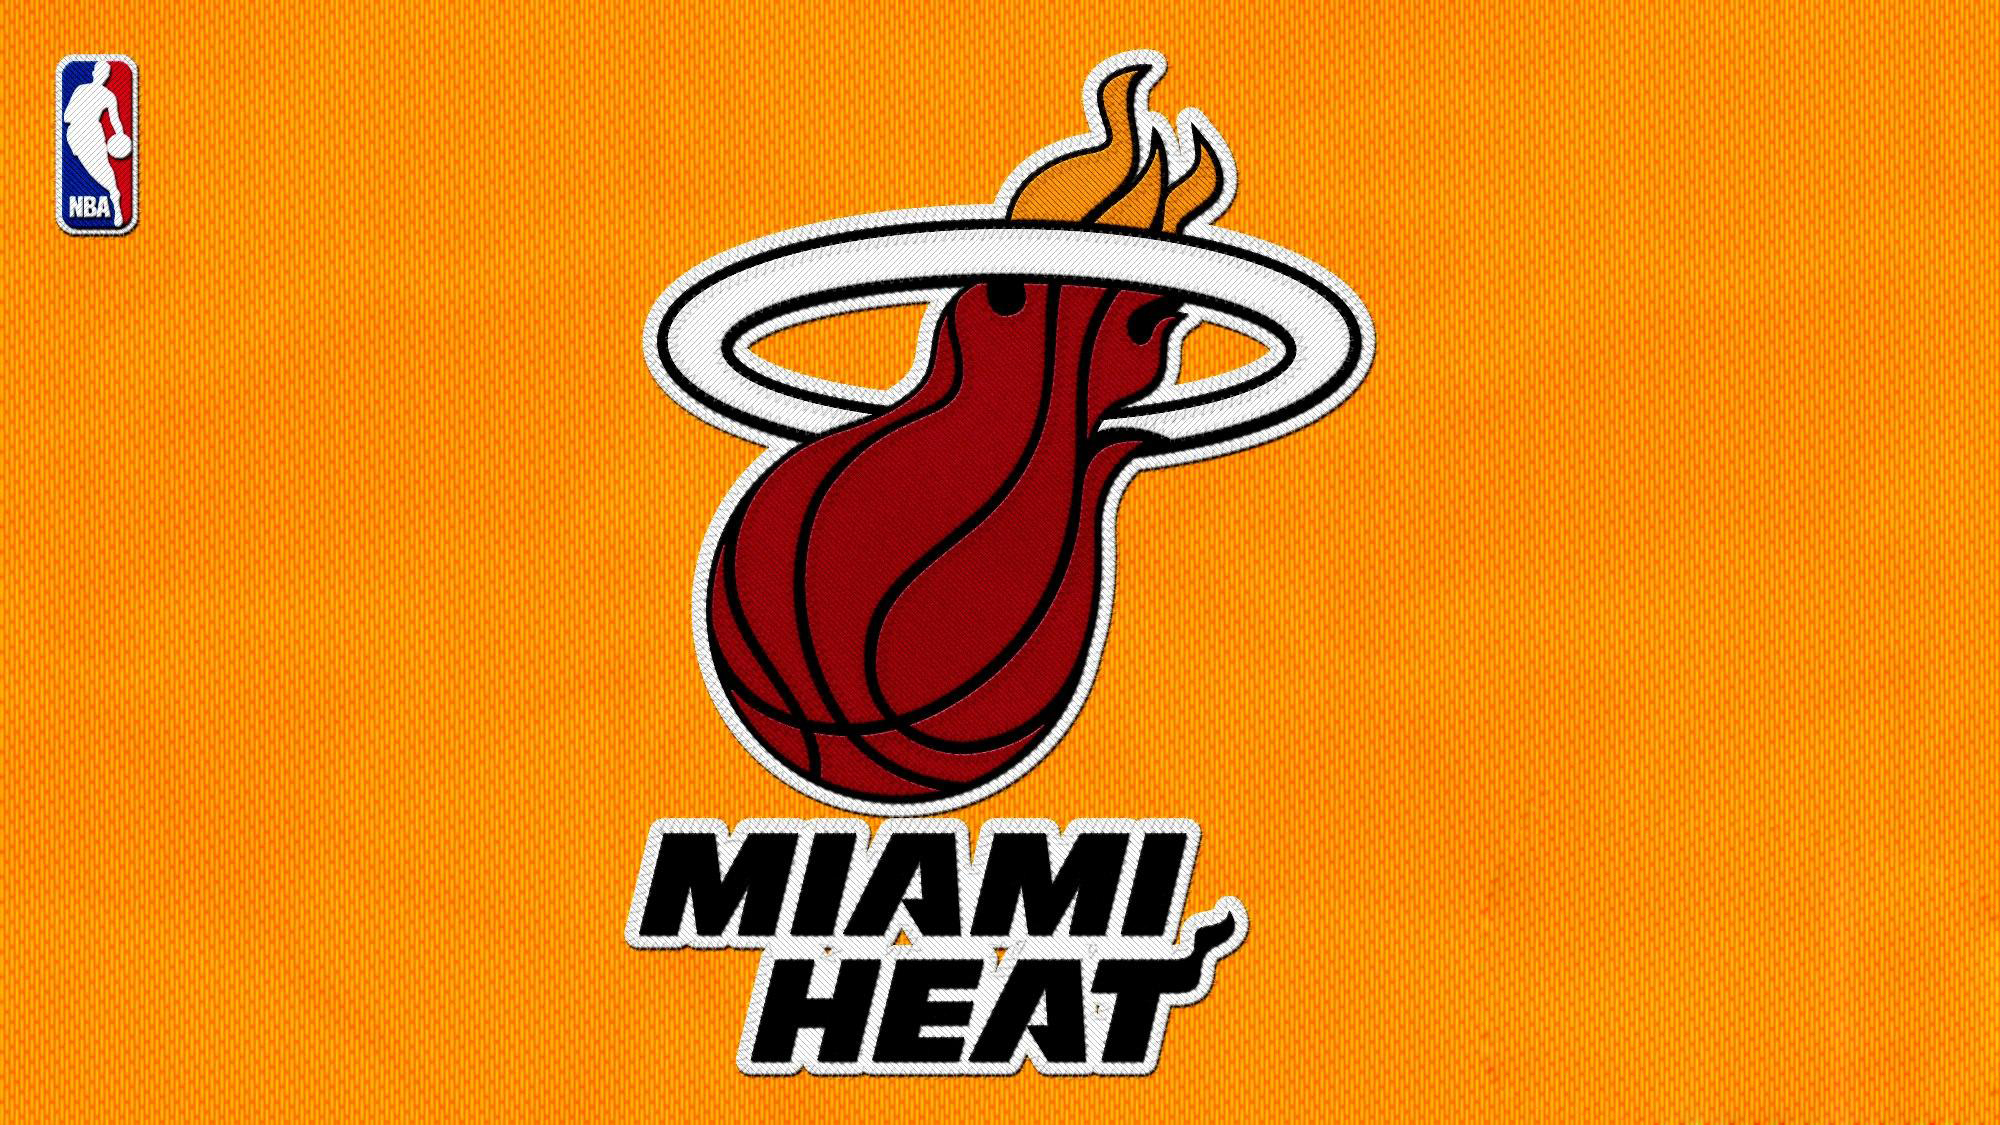 Nike Animated Wallpaper Logo Miami Heat Wallpapers Pixelstalk Net